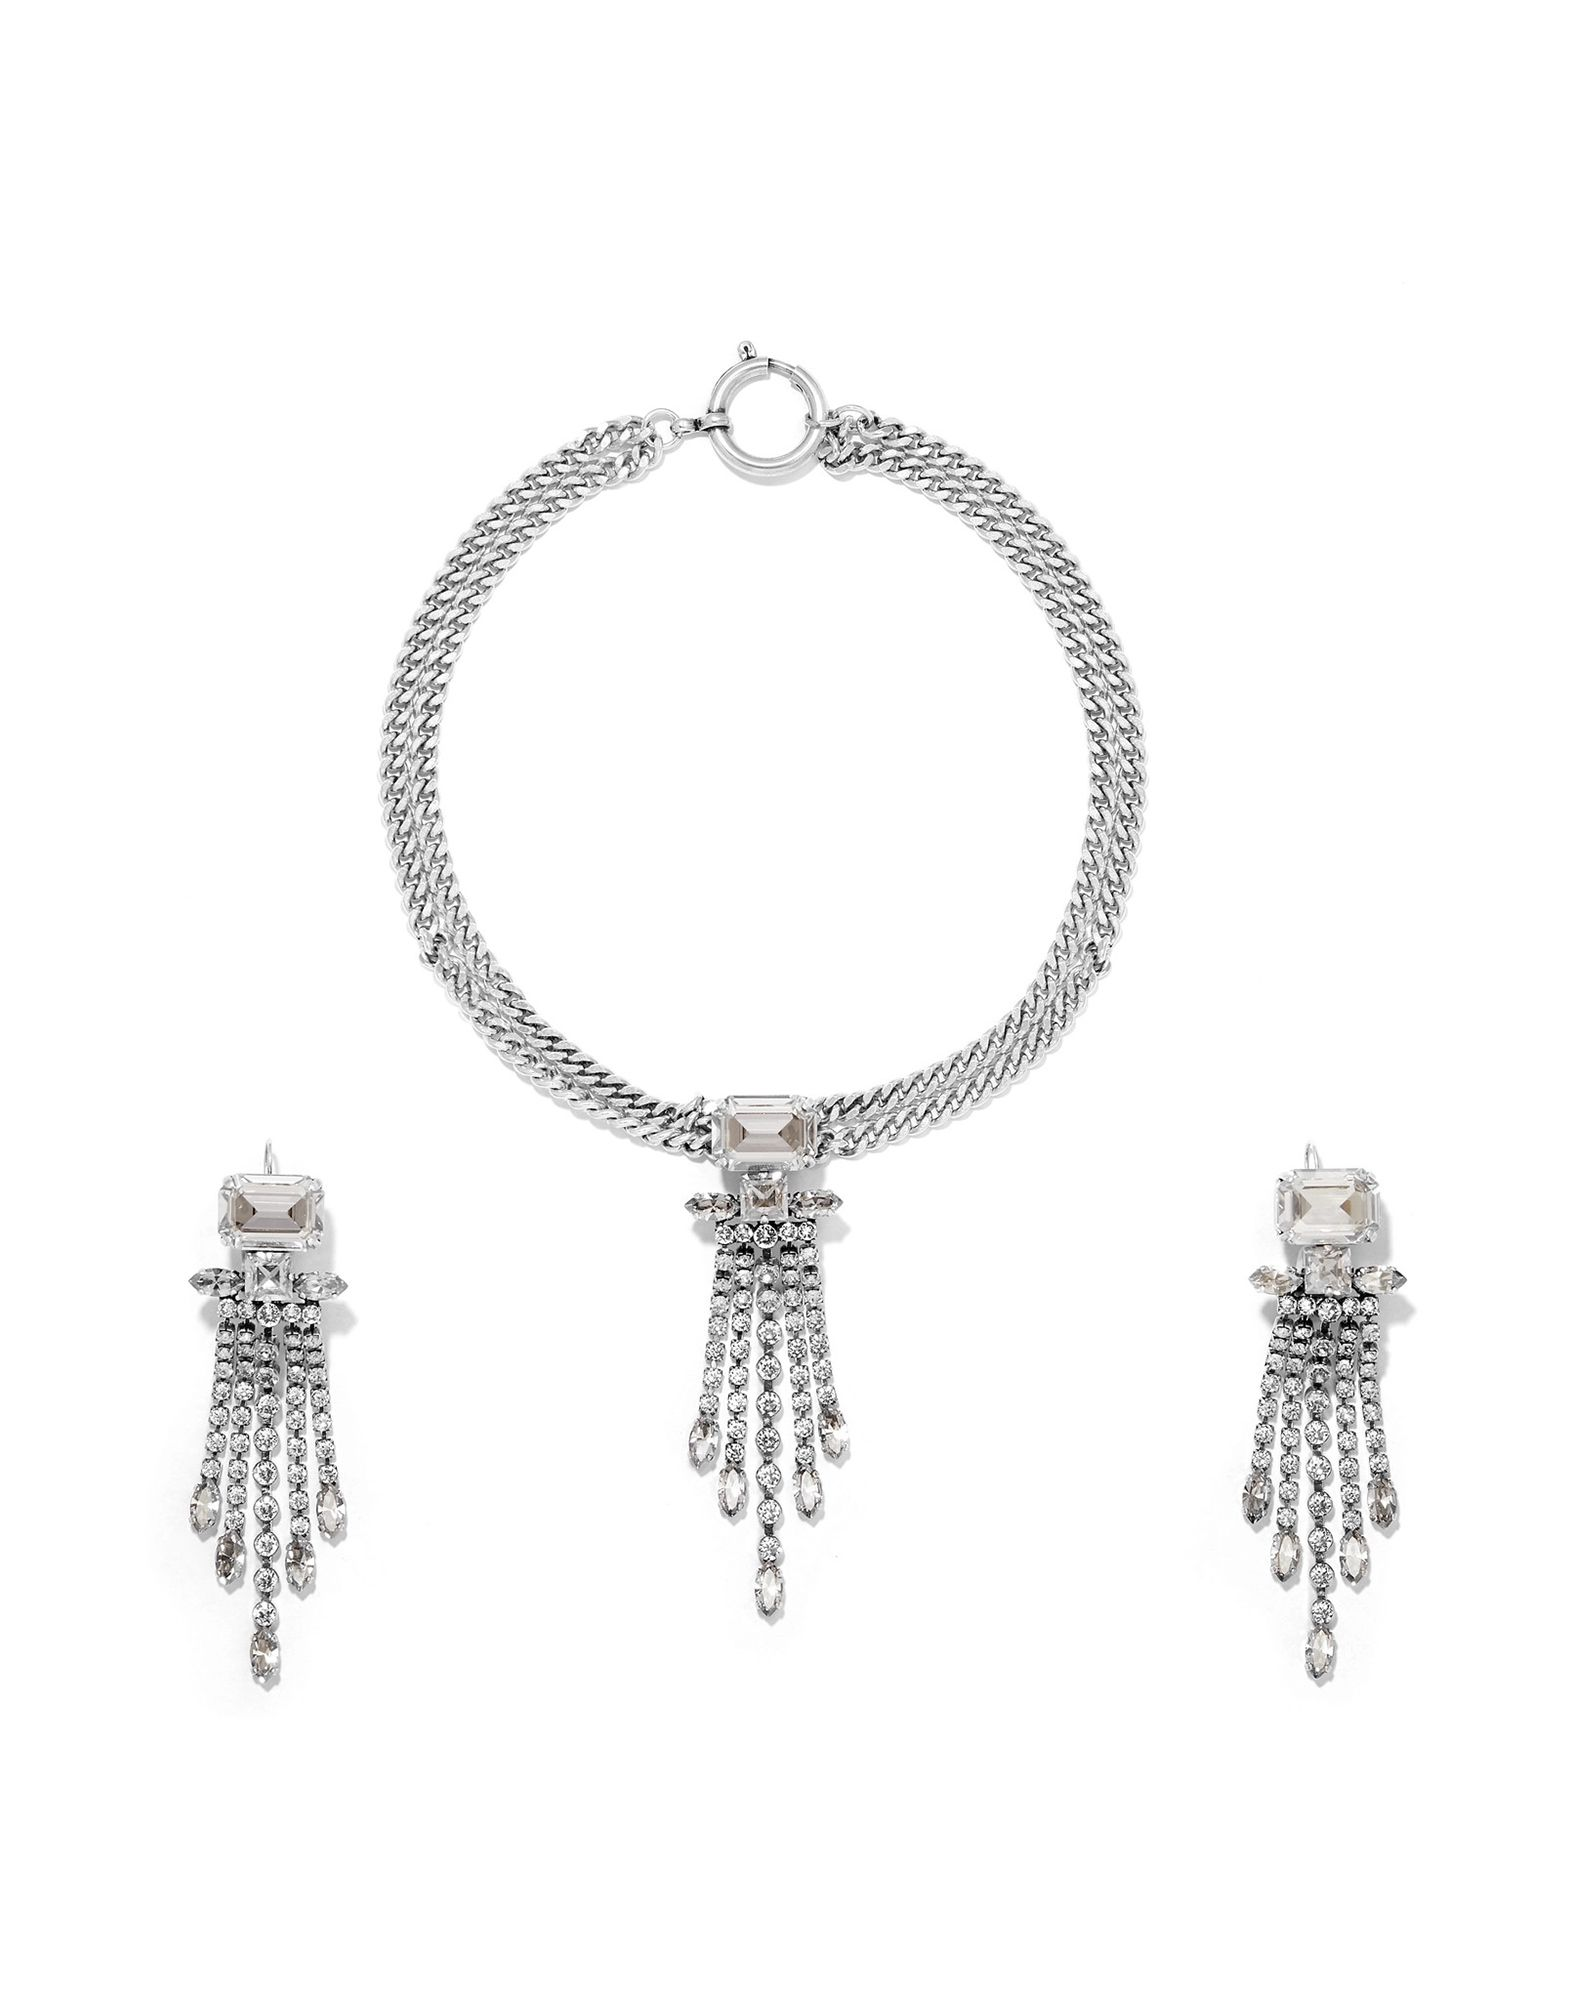 ISABEL MARANT Jewelry sets. rhinestones, clasp fastening. Metal